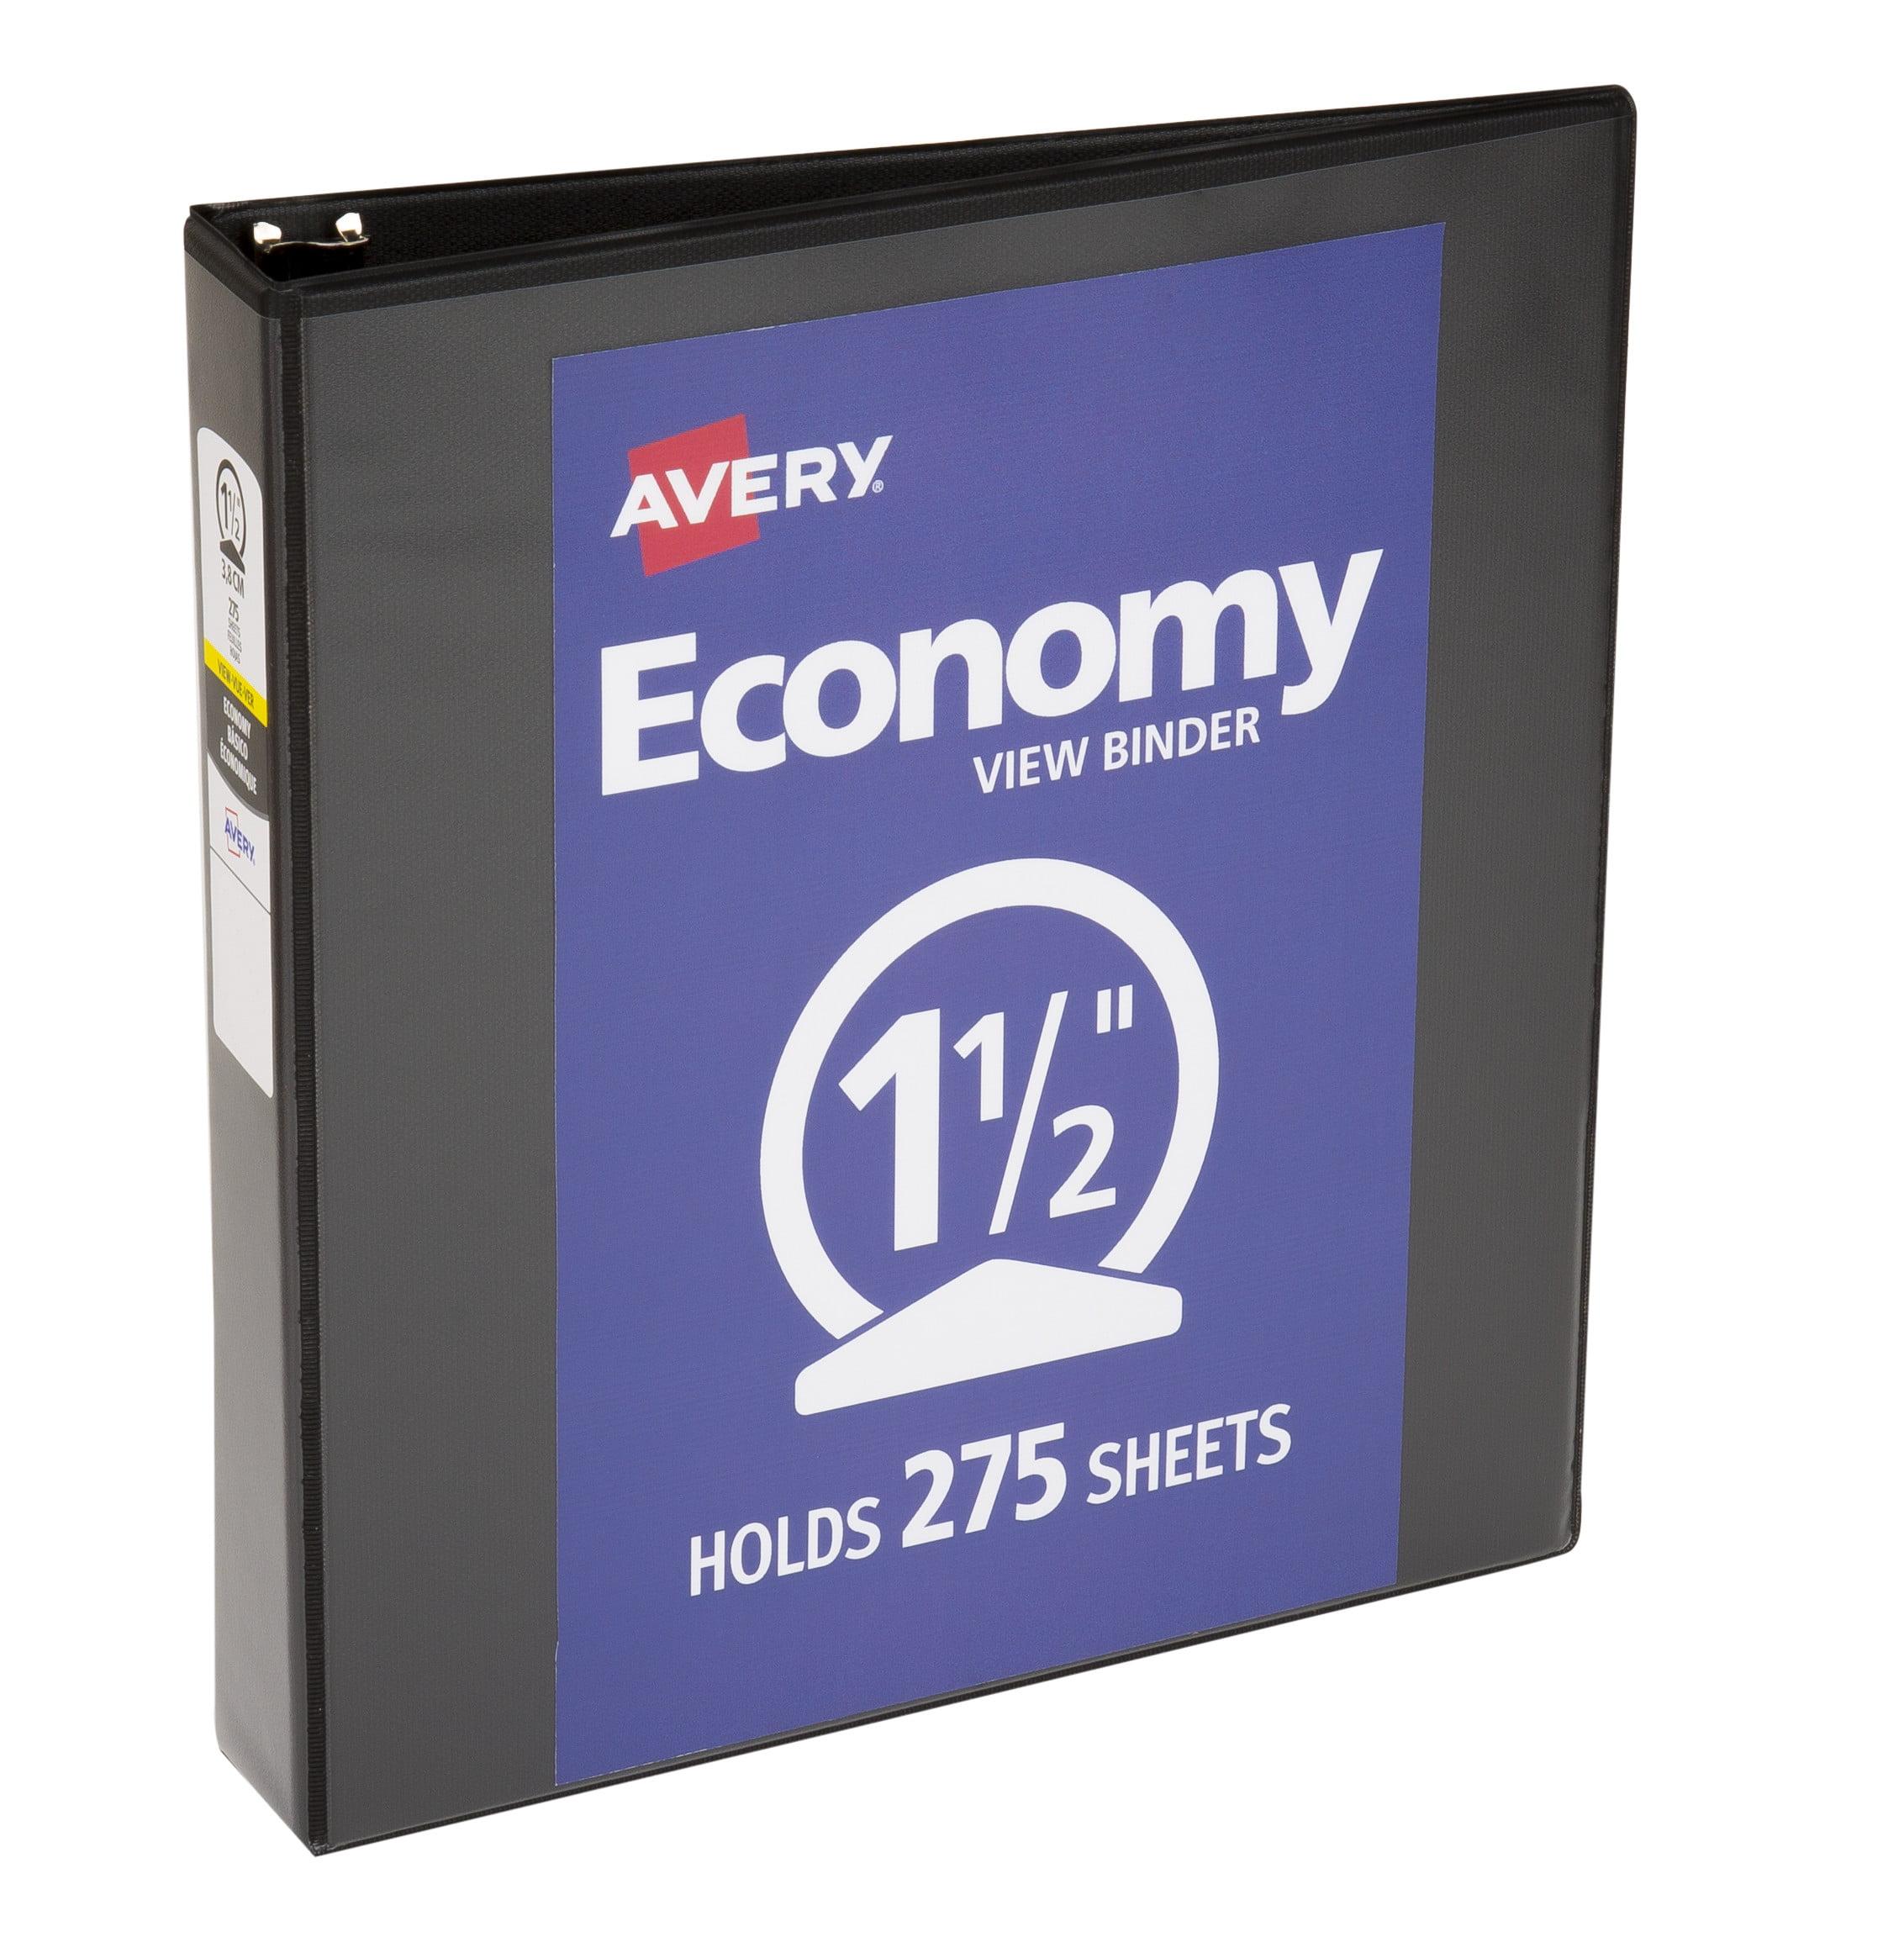 "Avery 1.5"" Economy View Binder, Round Rings, Black, 275"